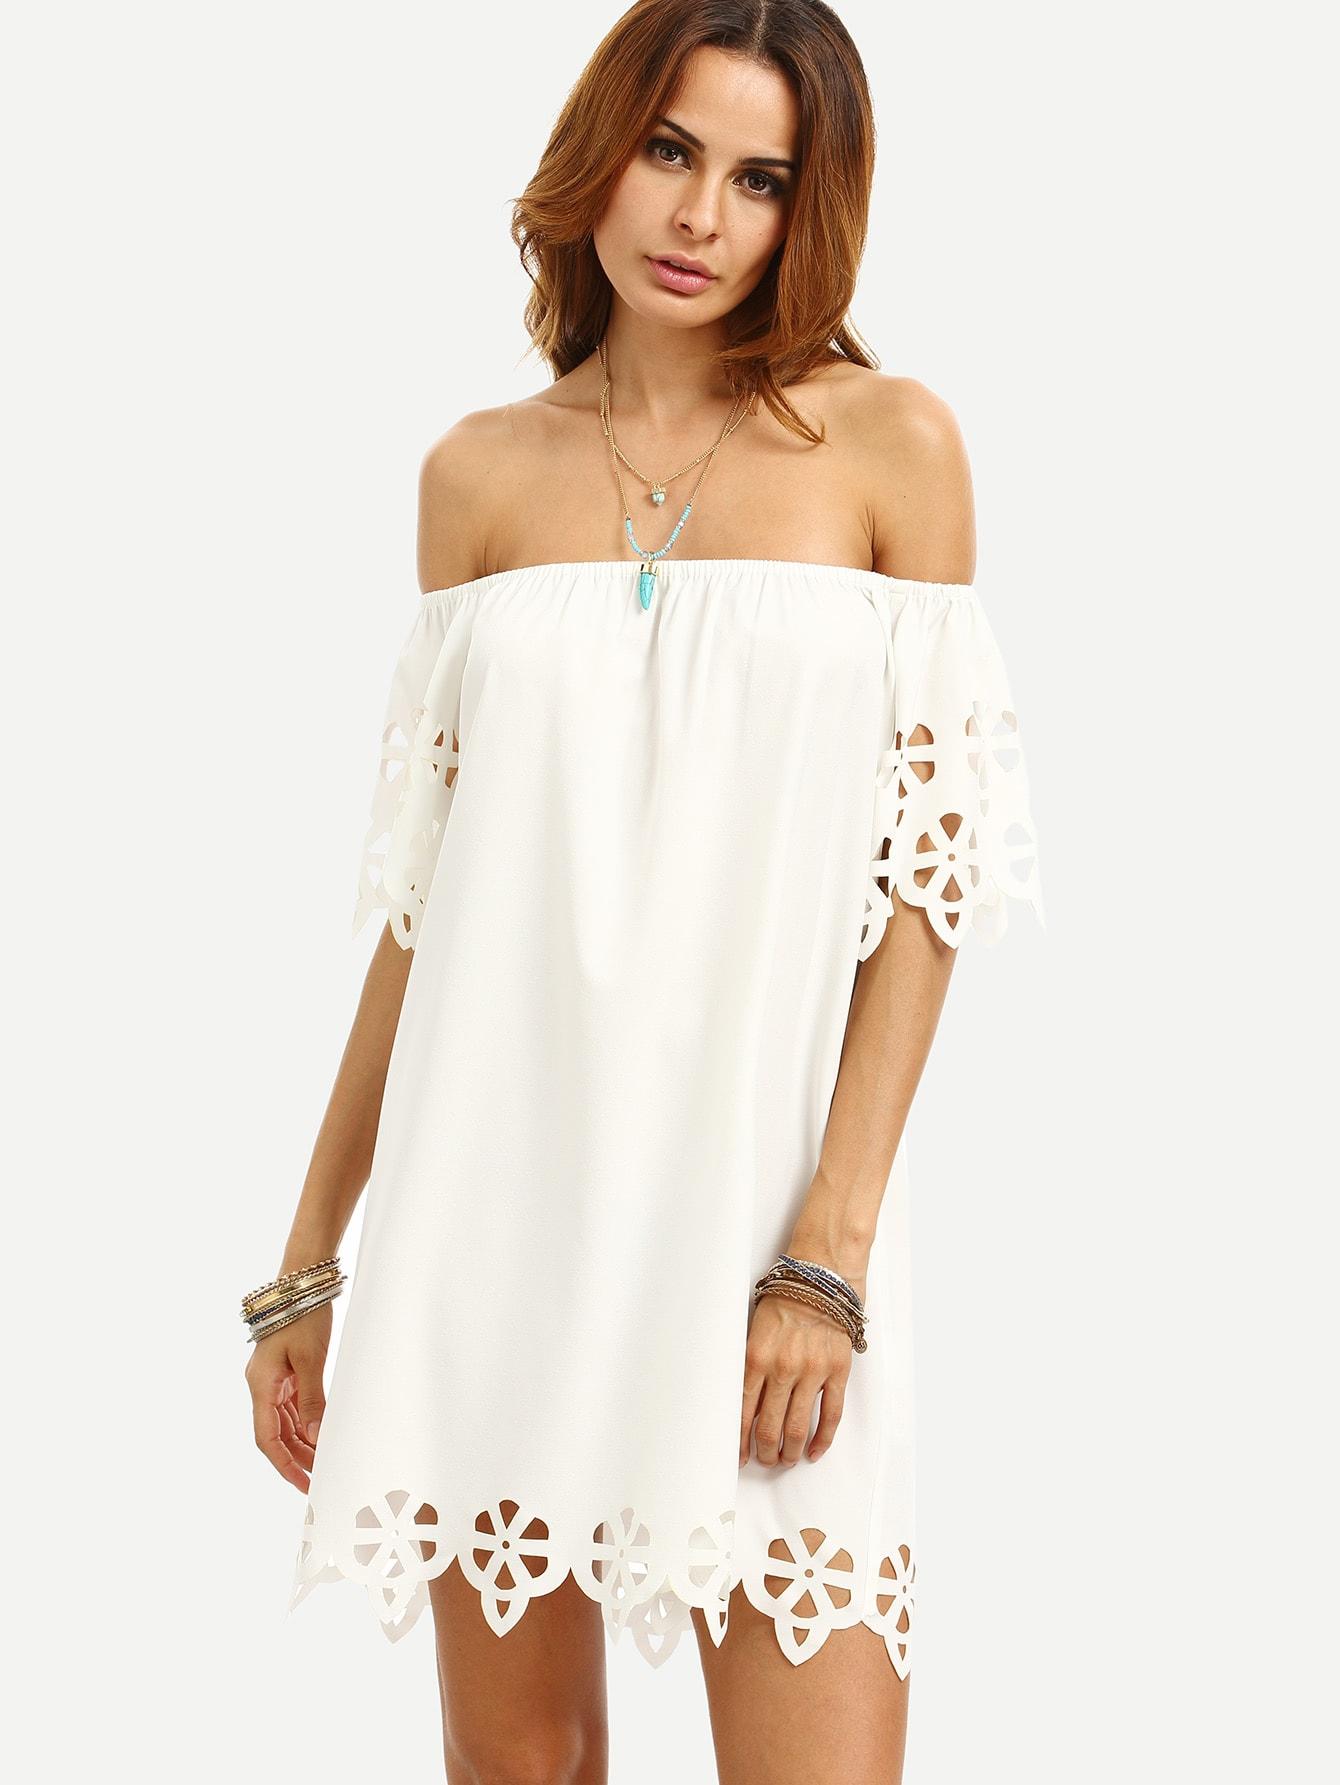 Scallop Hollow Out Hem Bardot Dress bardot neckline scallop hem dress